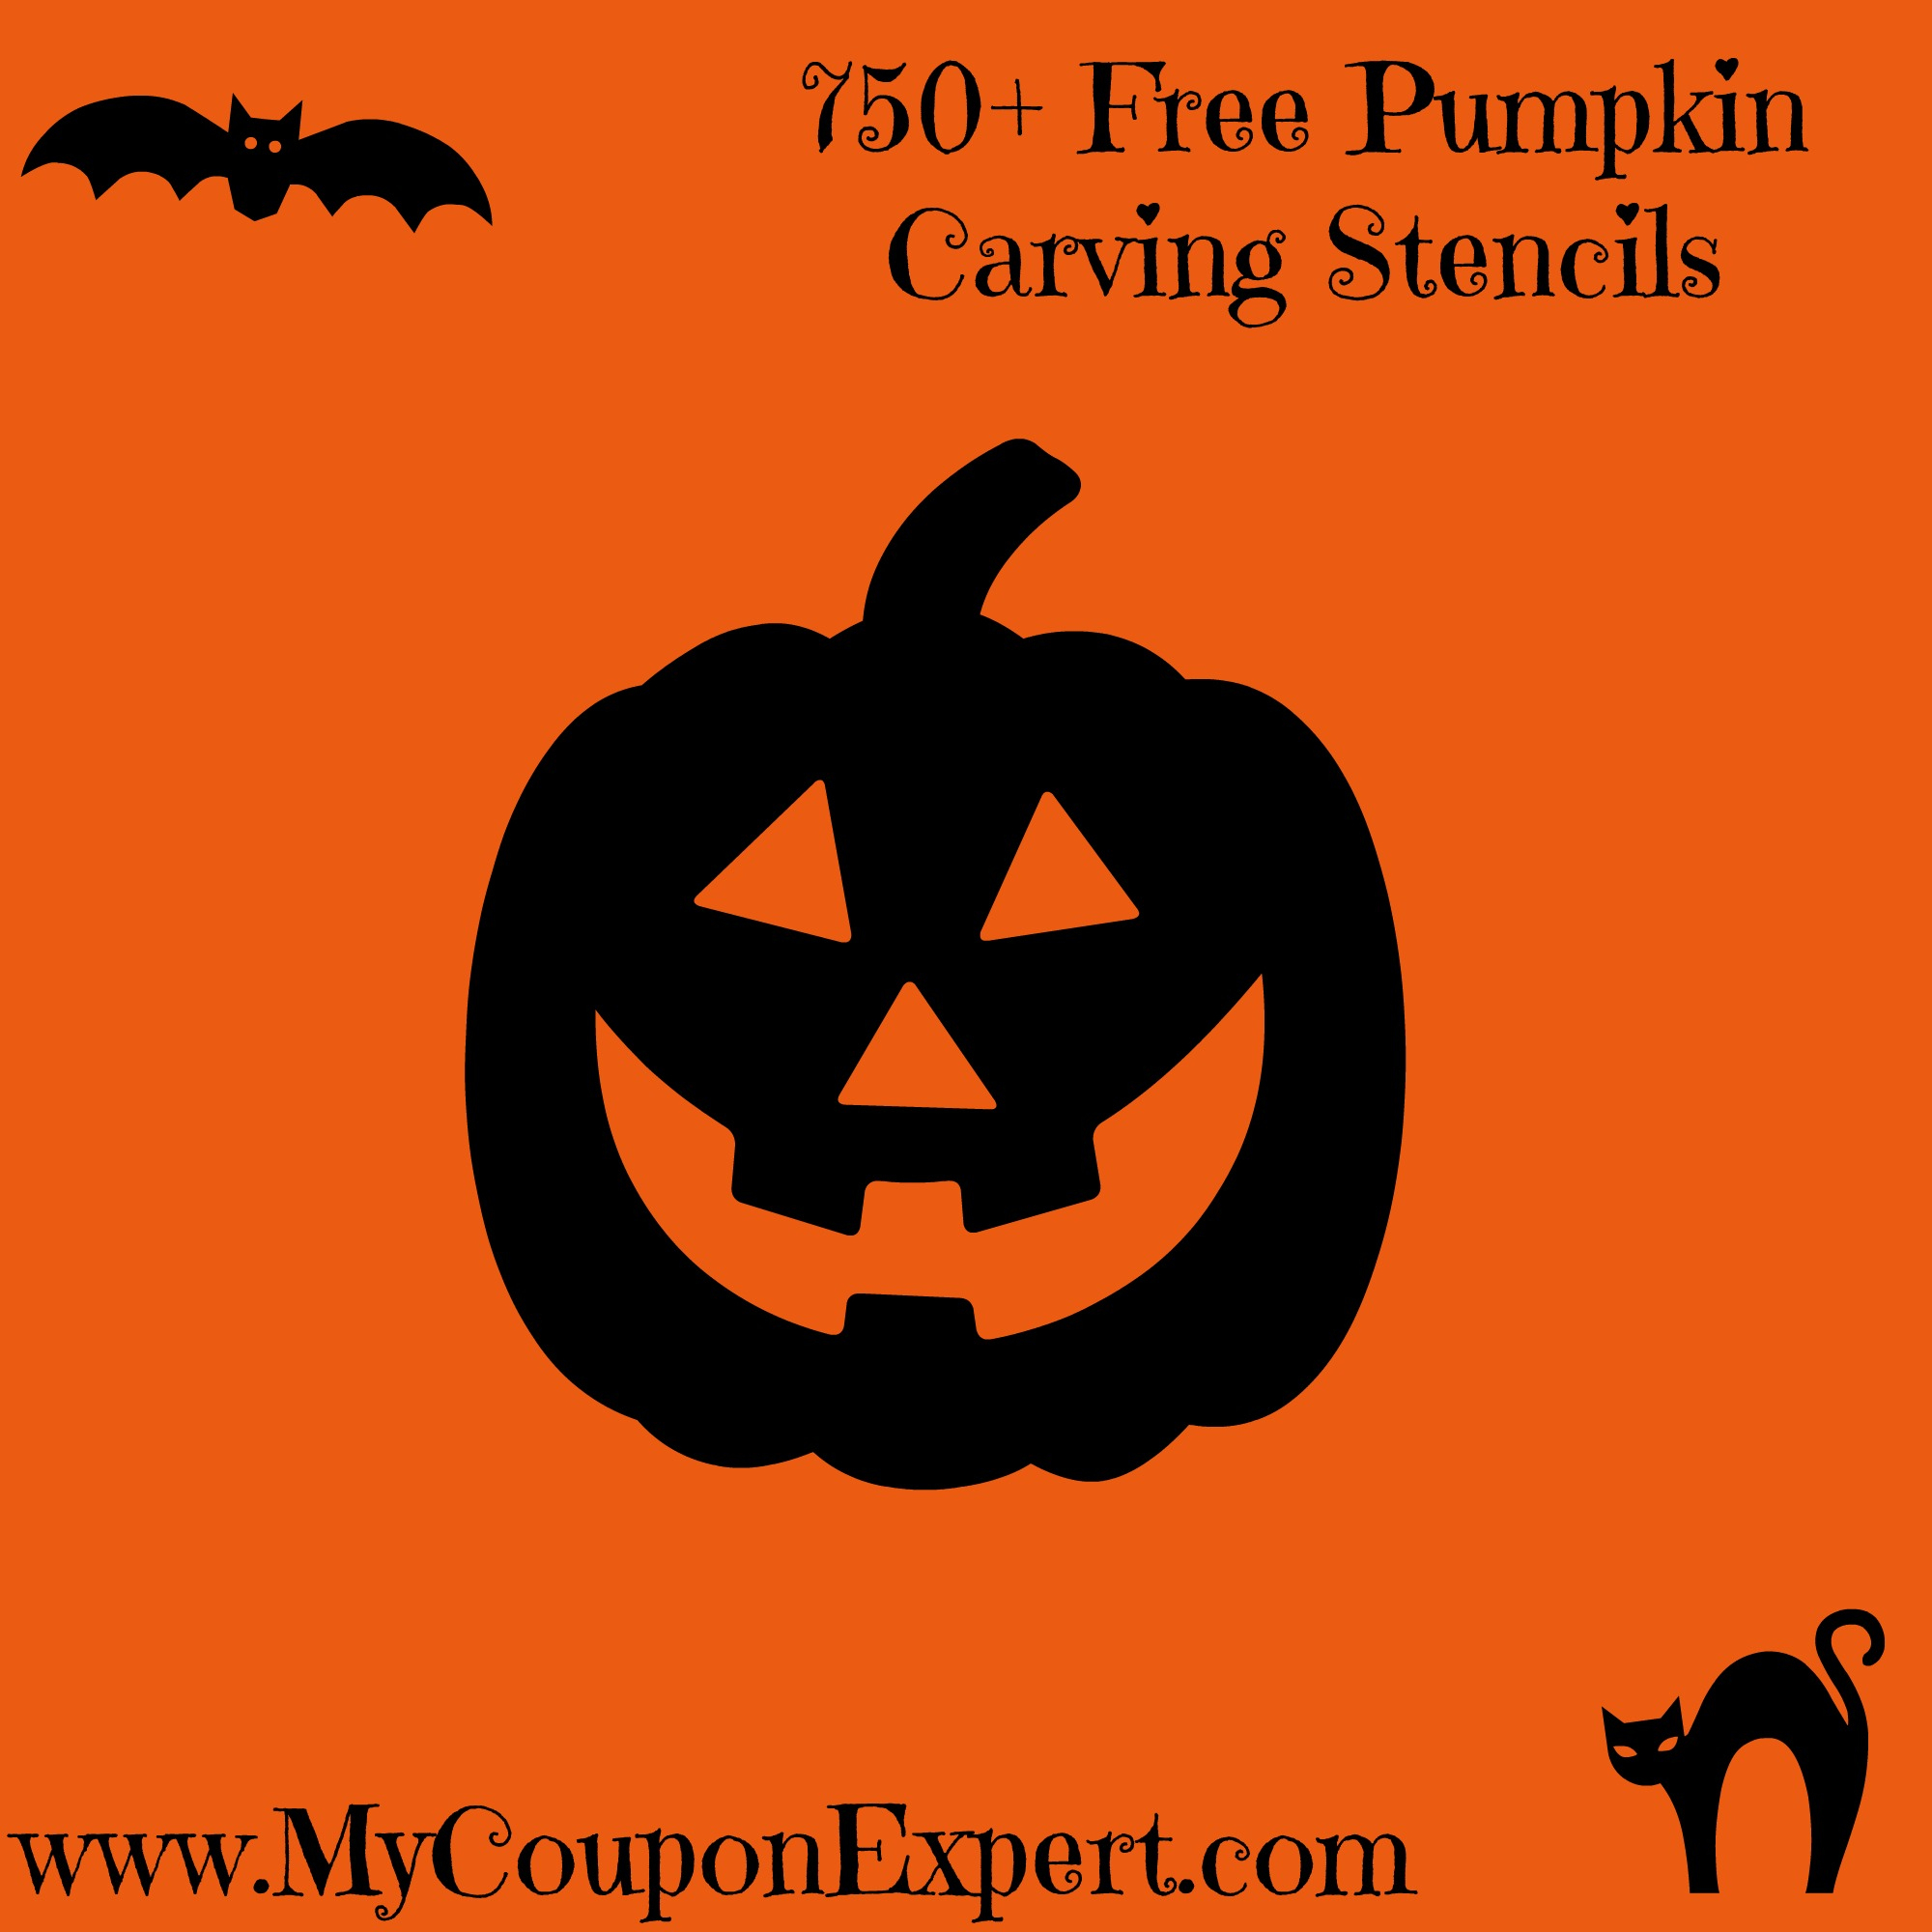 750+ Free Pumpkin Carving Stencils · - Pumpkin Patterns Free Printable